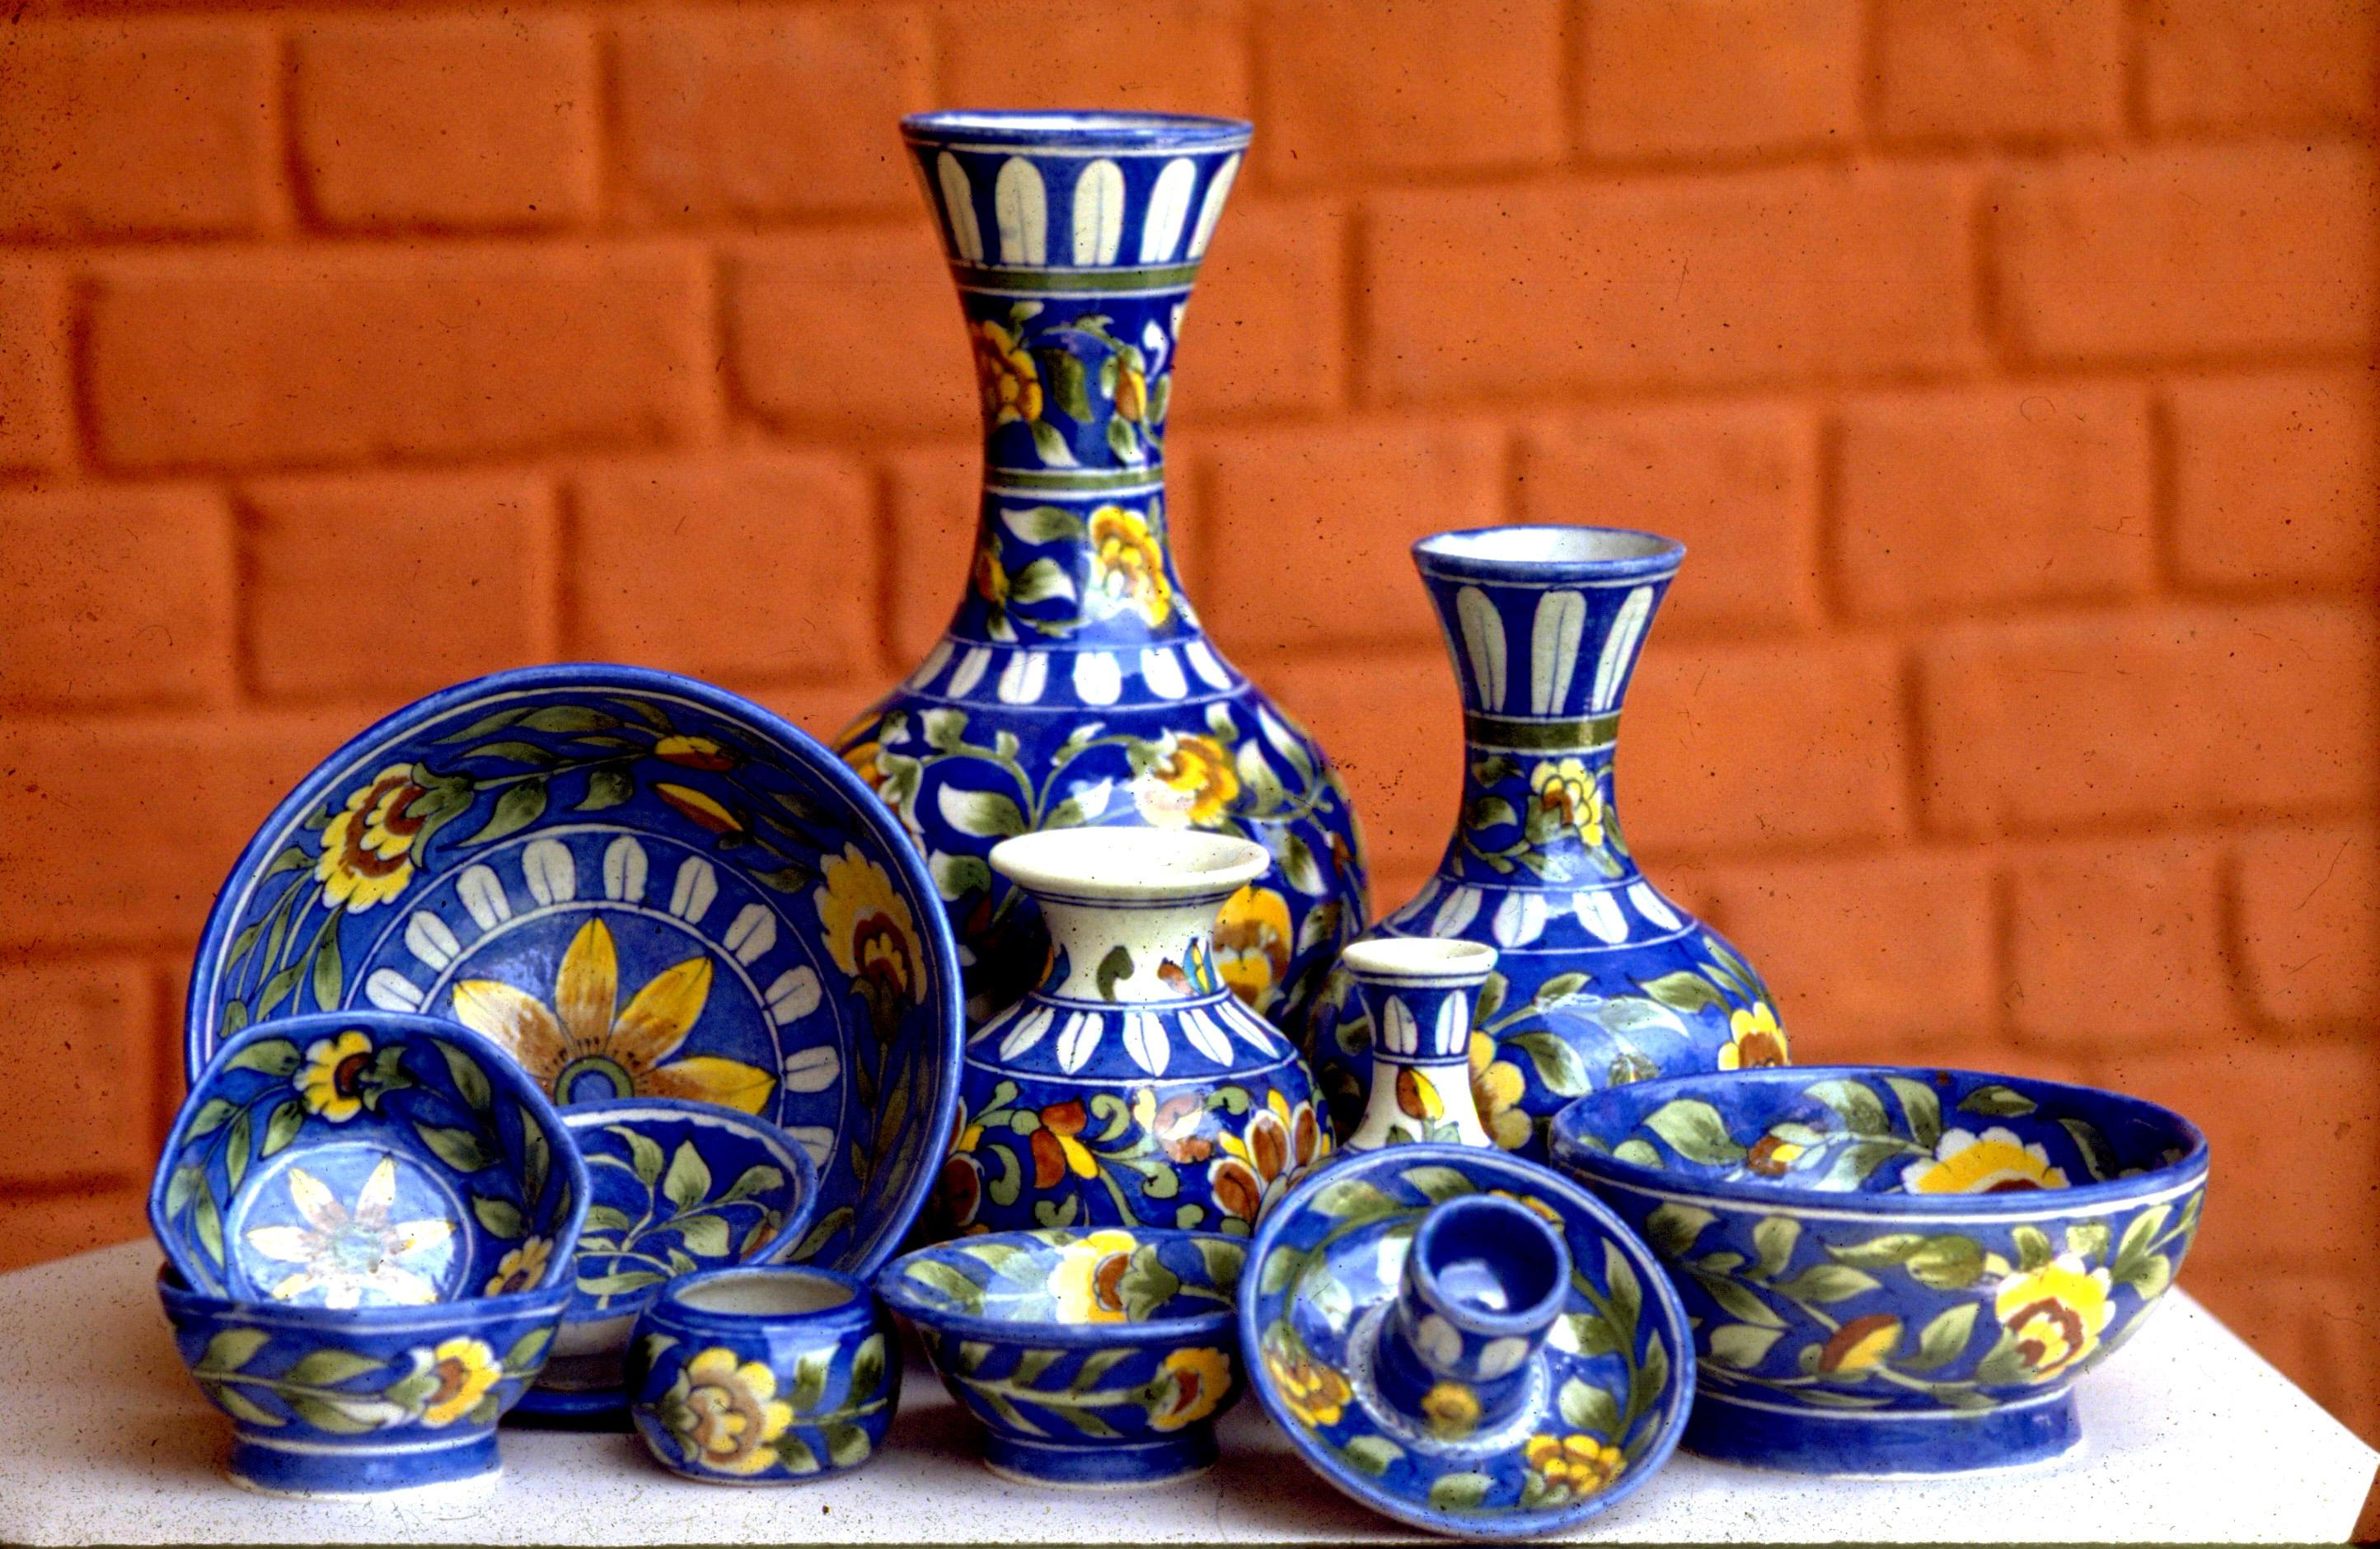 Blue Pottery India Handicrafts Decor Textiles Artisan Crafts Blue Pottery Pottery Indian Pottery